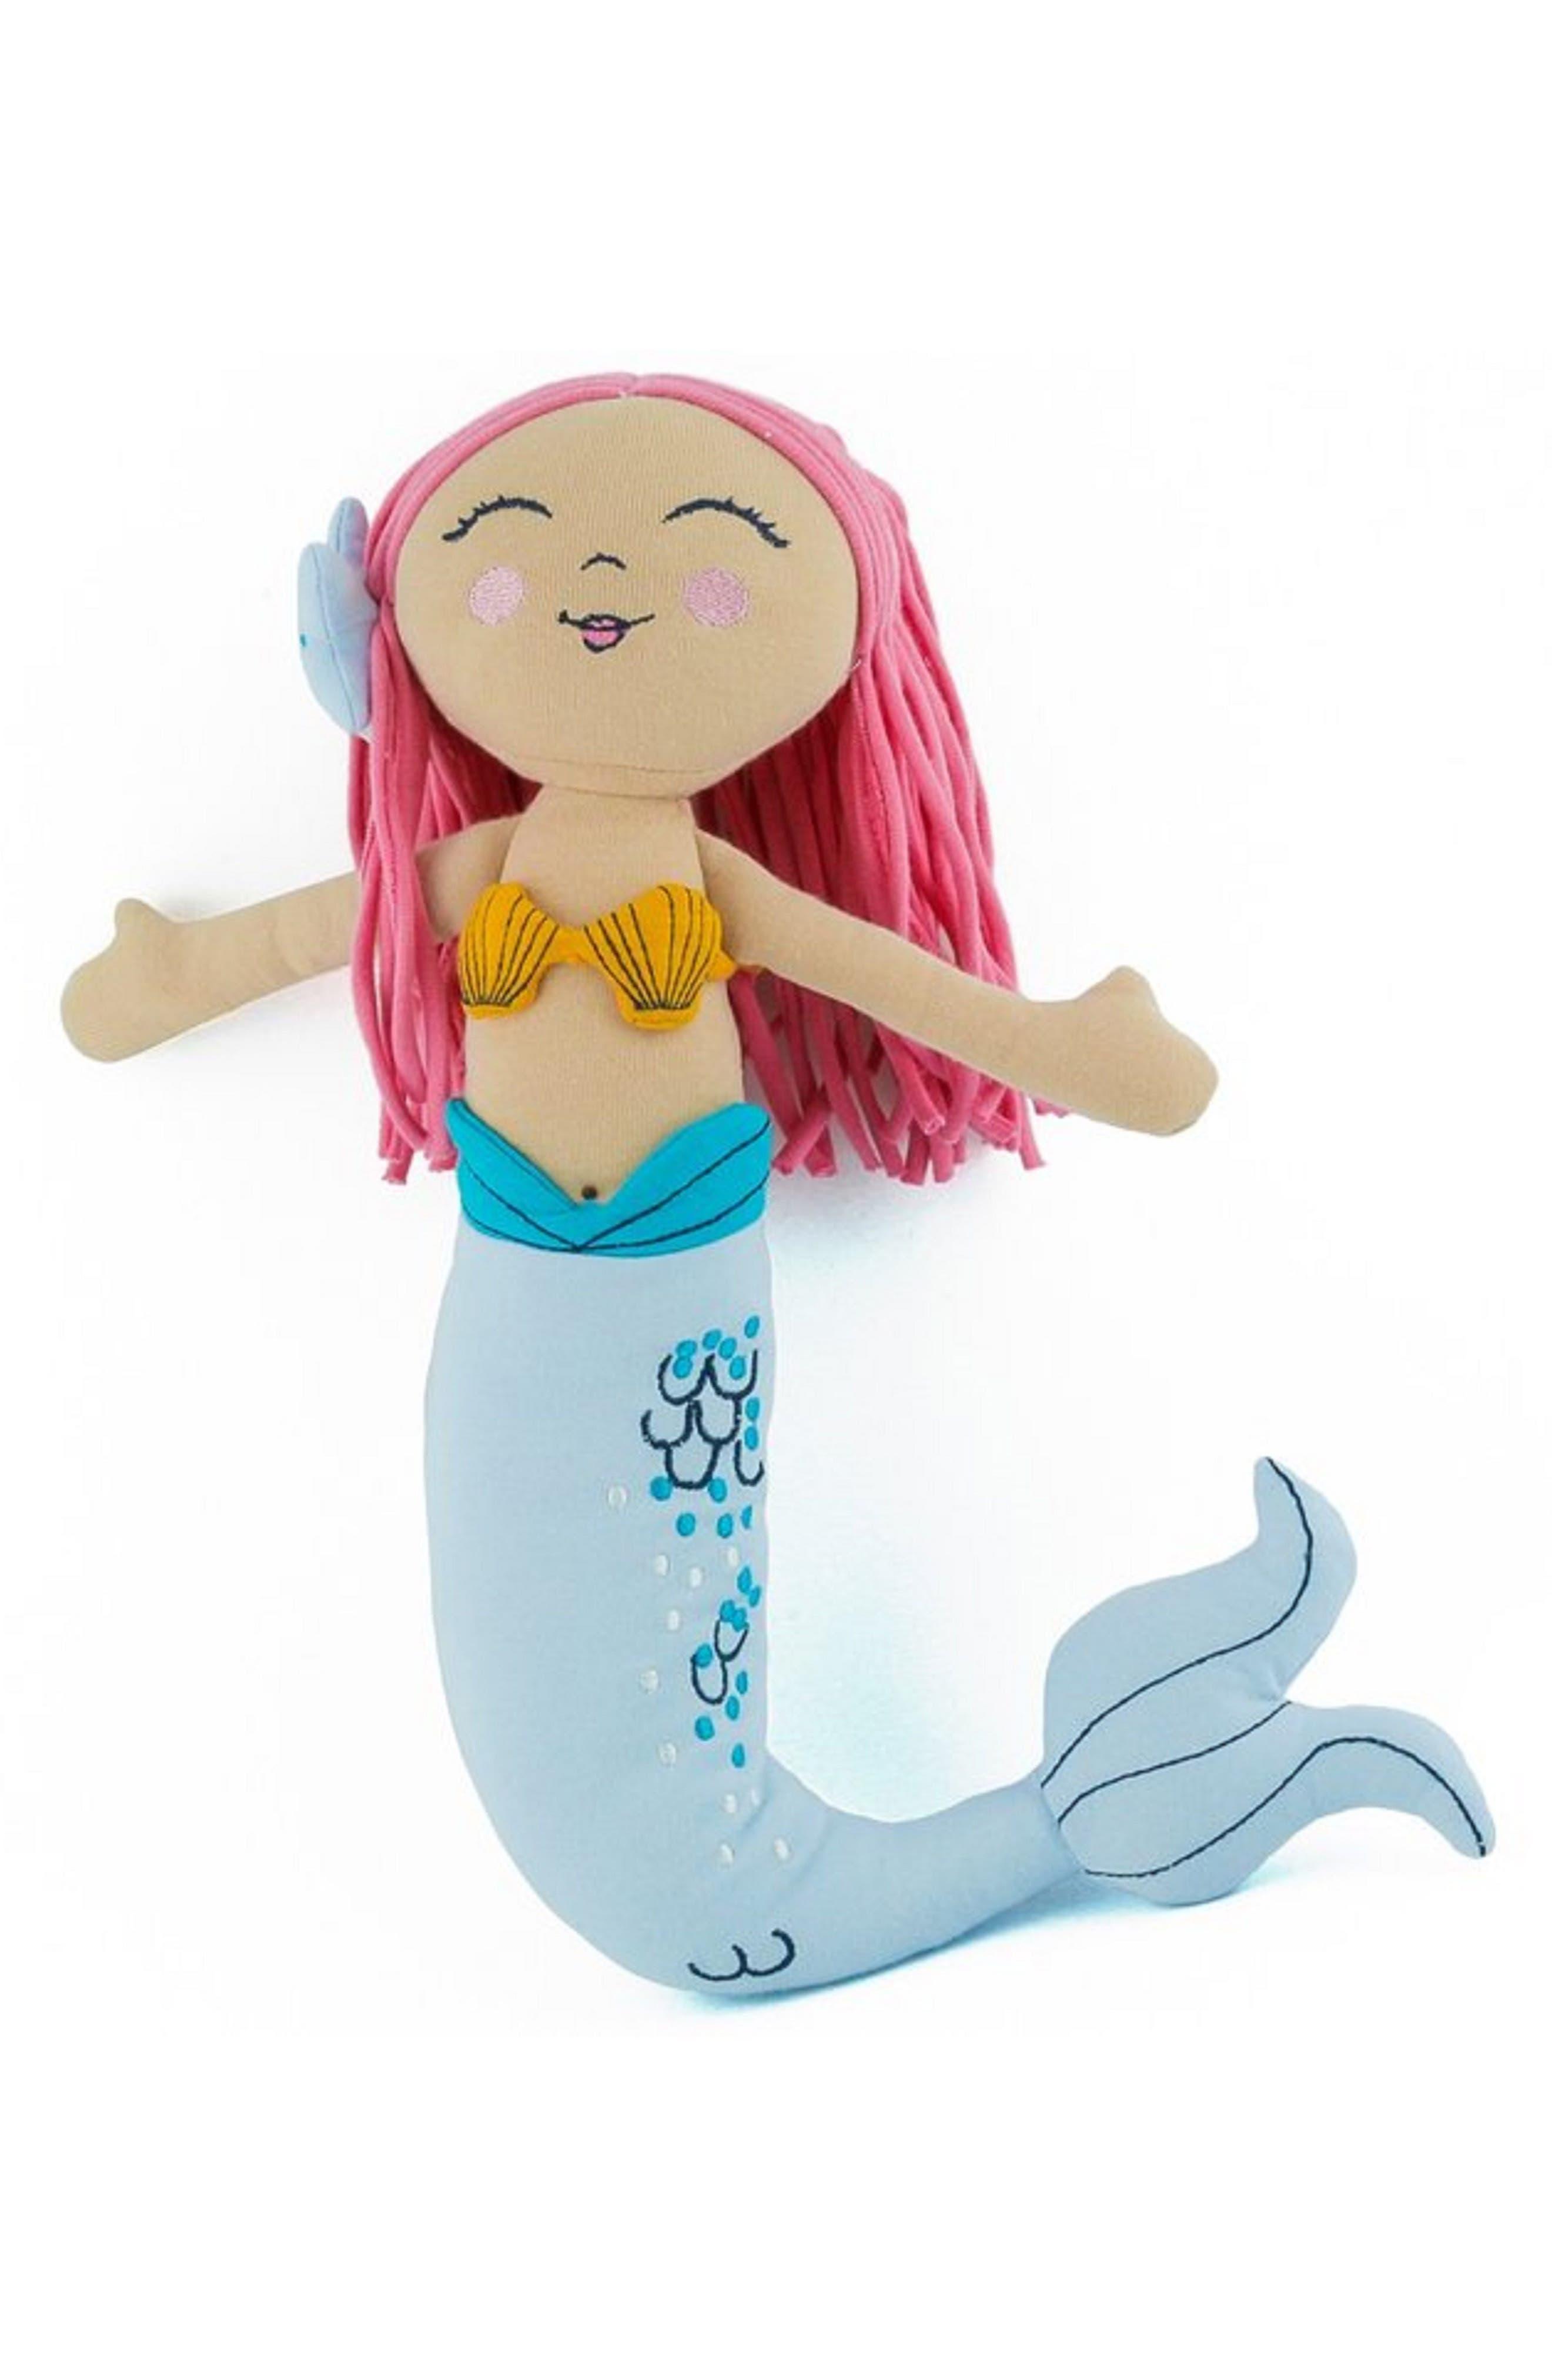 Ella Mermaid Stuffed Doll,                             Main thumbnail 1, color,                             400